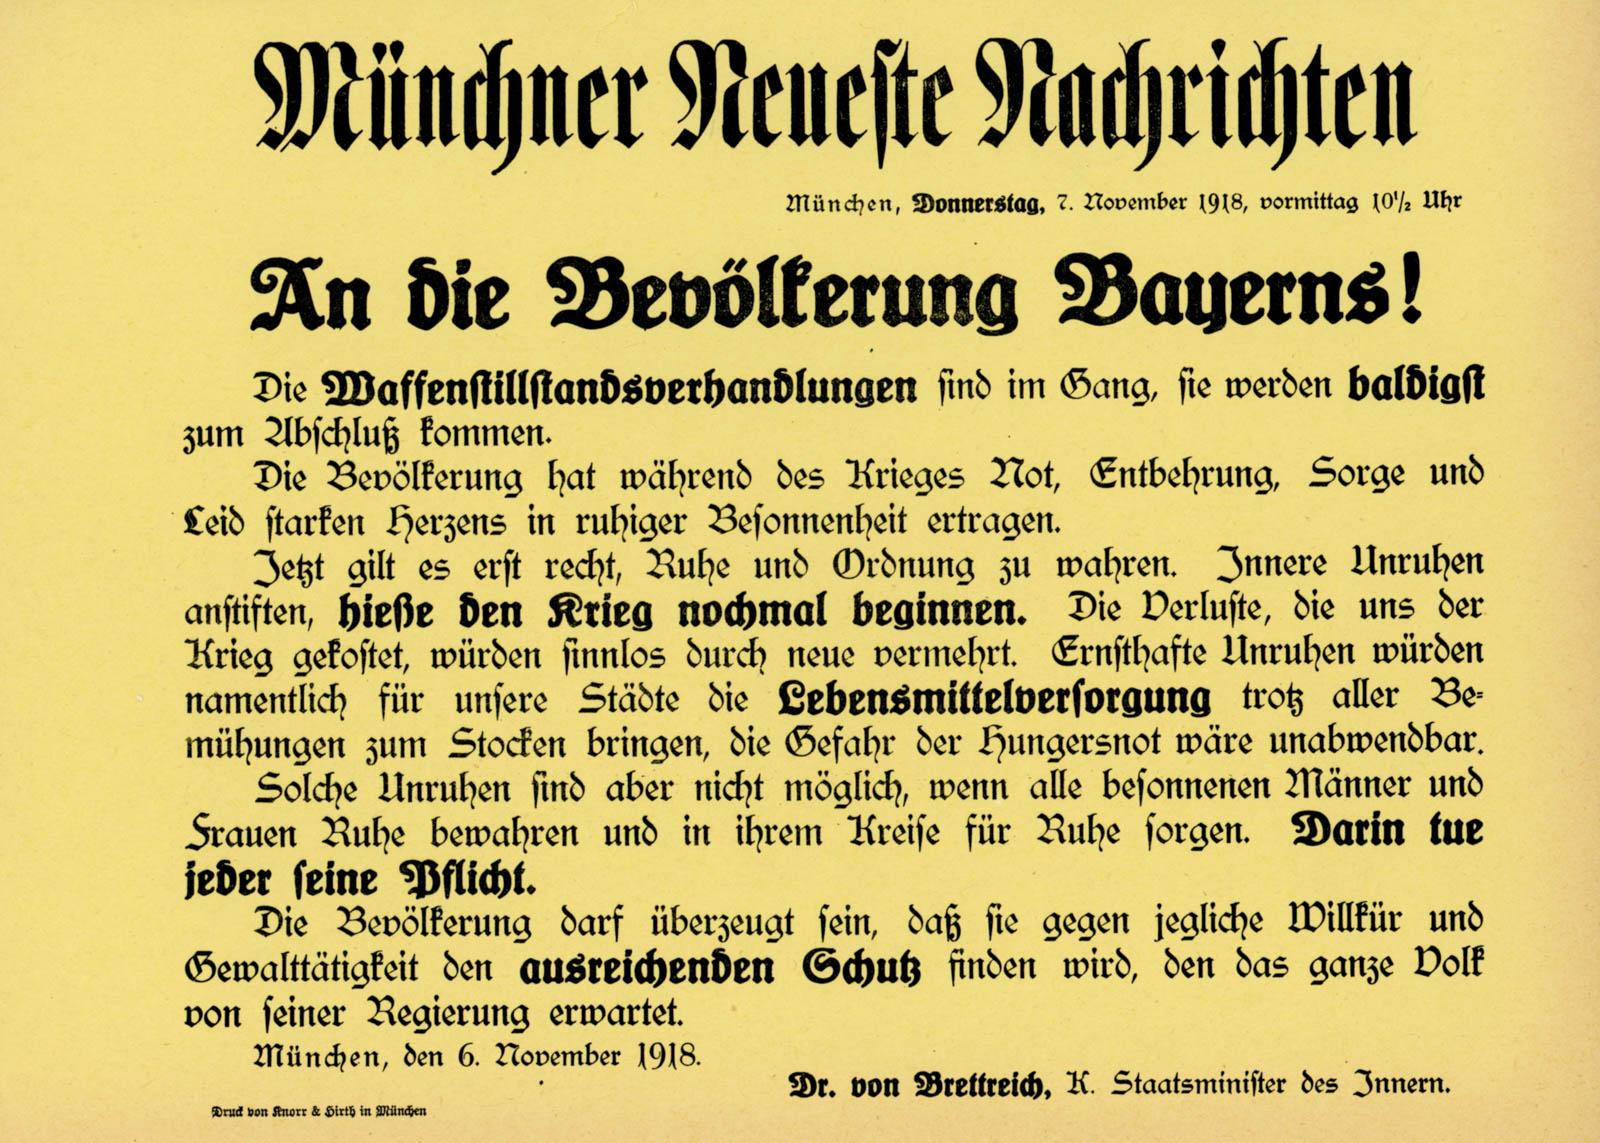 An die Bevölkerung Bayerns!